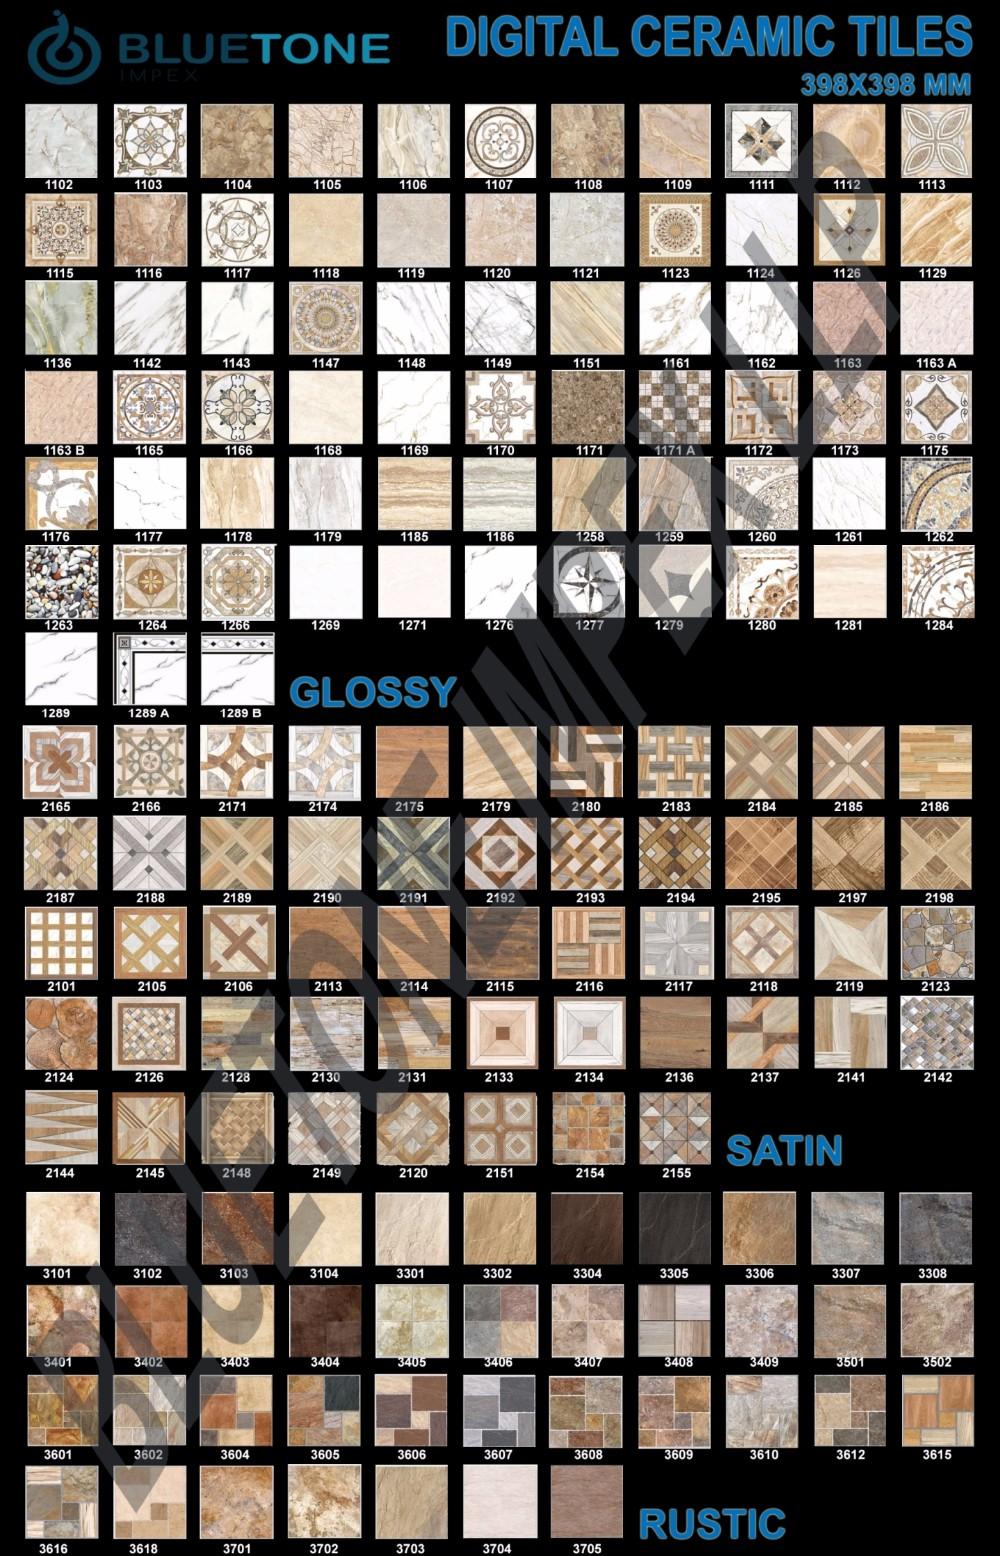 Double charge vitrified tiles flor vitrified marble tiles price in double charge vitrified tiles flor vitrified marble tiles price in india 800 x 800mm dailygadgetfo Choice Image